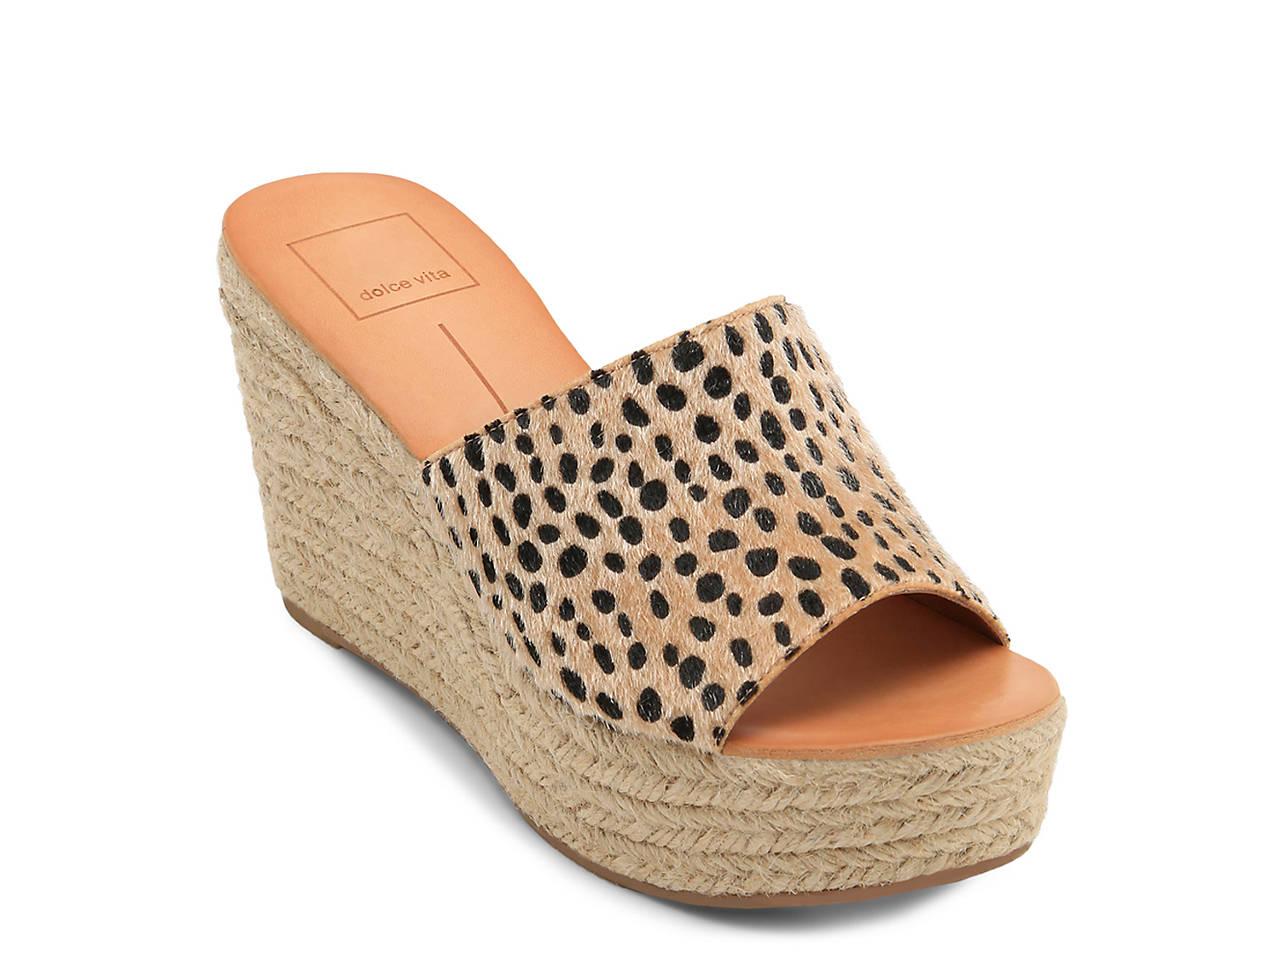 2d2b2c5b843 Dolce Vita Bela Espadrille Wedge Sandal Women s Shoes